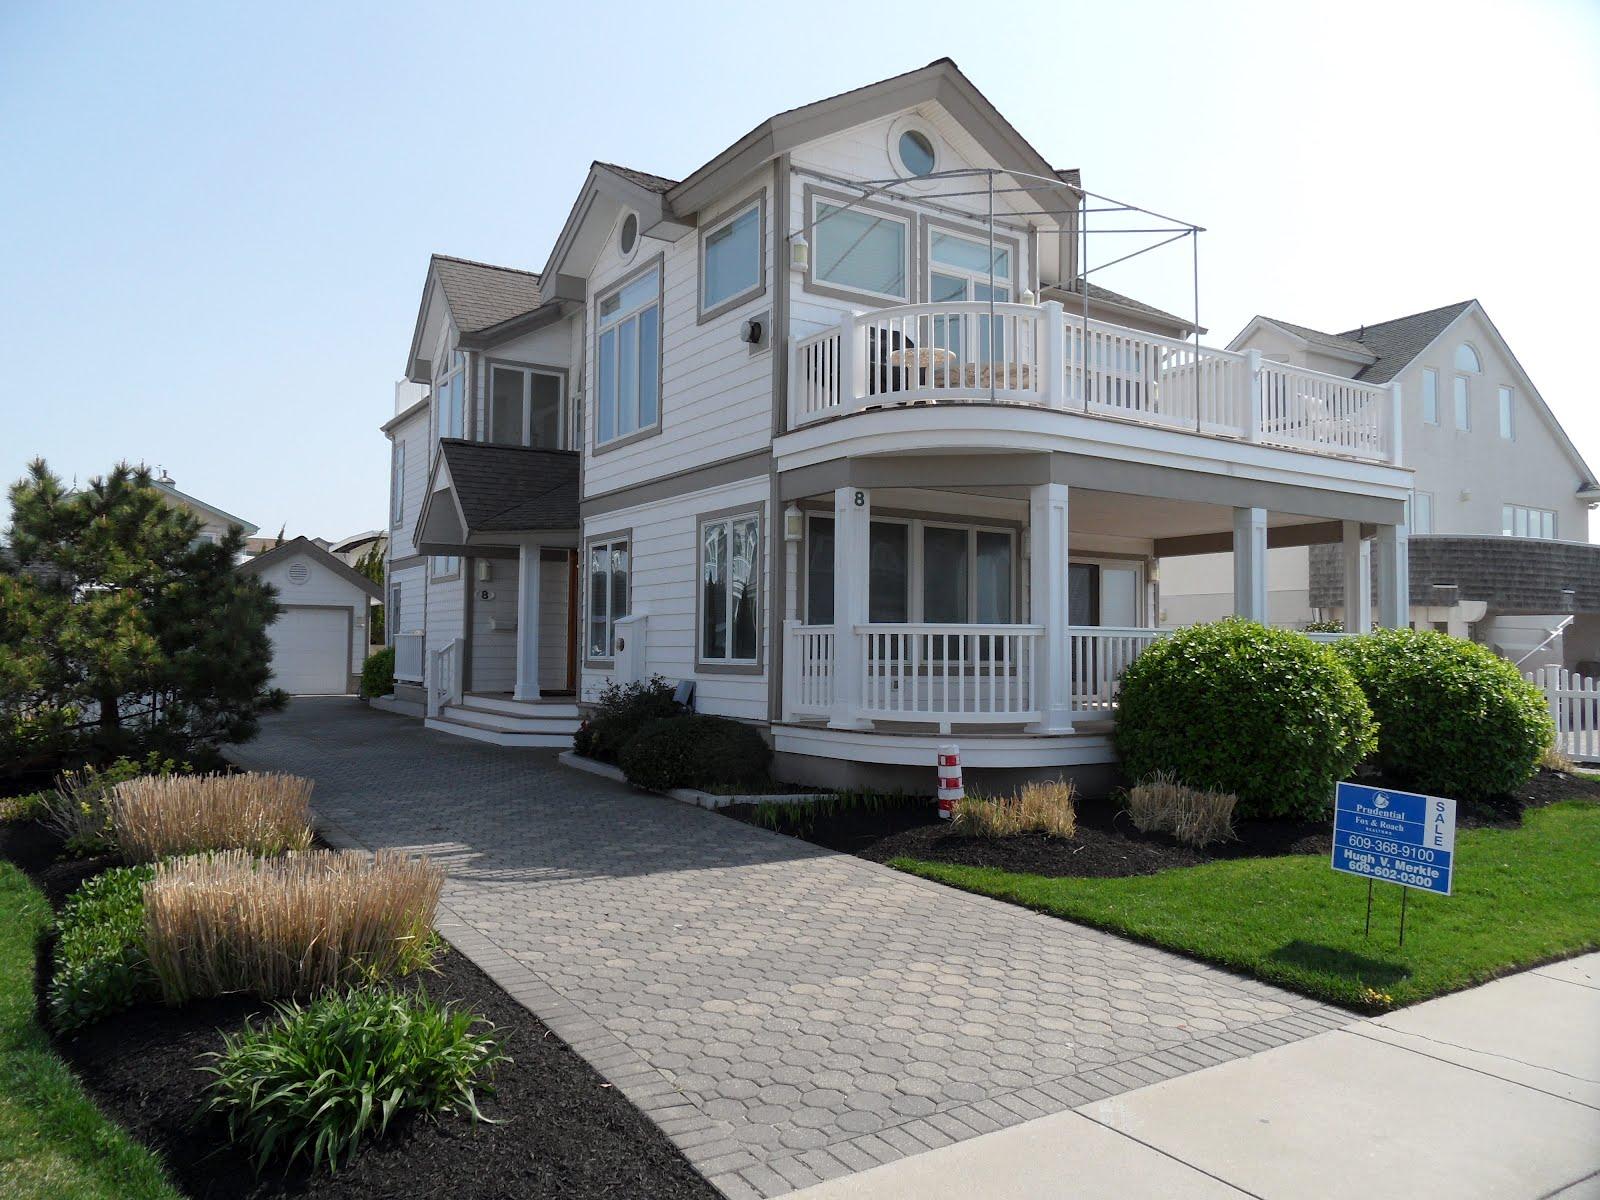 Granite Block Home : Stone harbor s real estate sale rd st